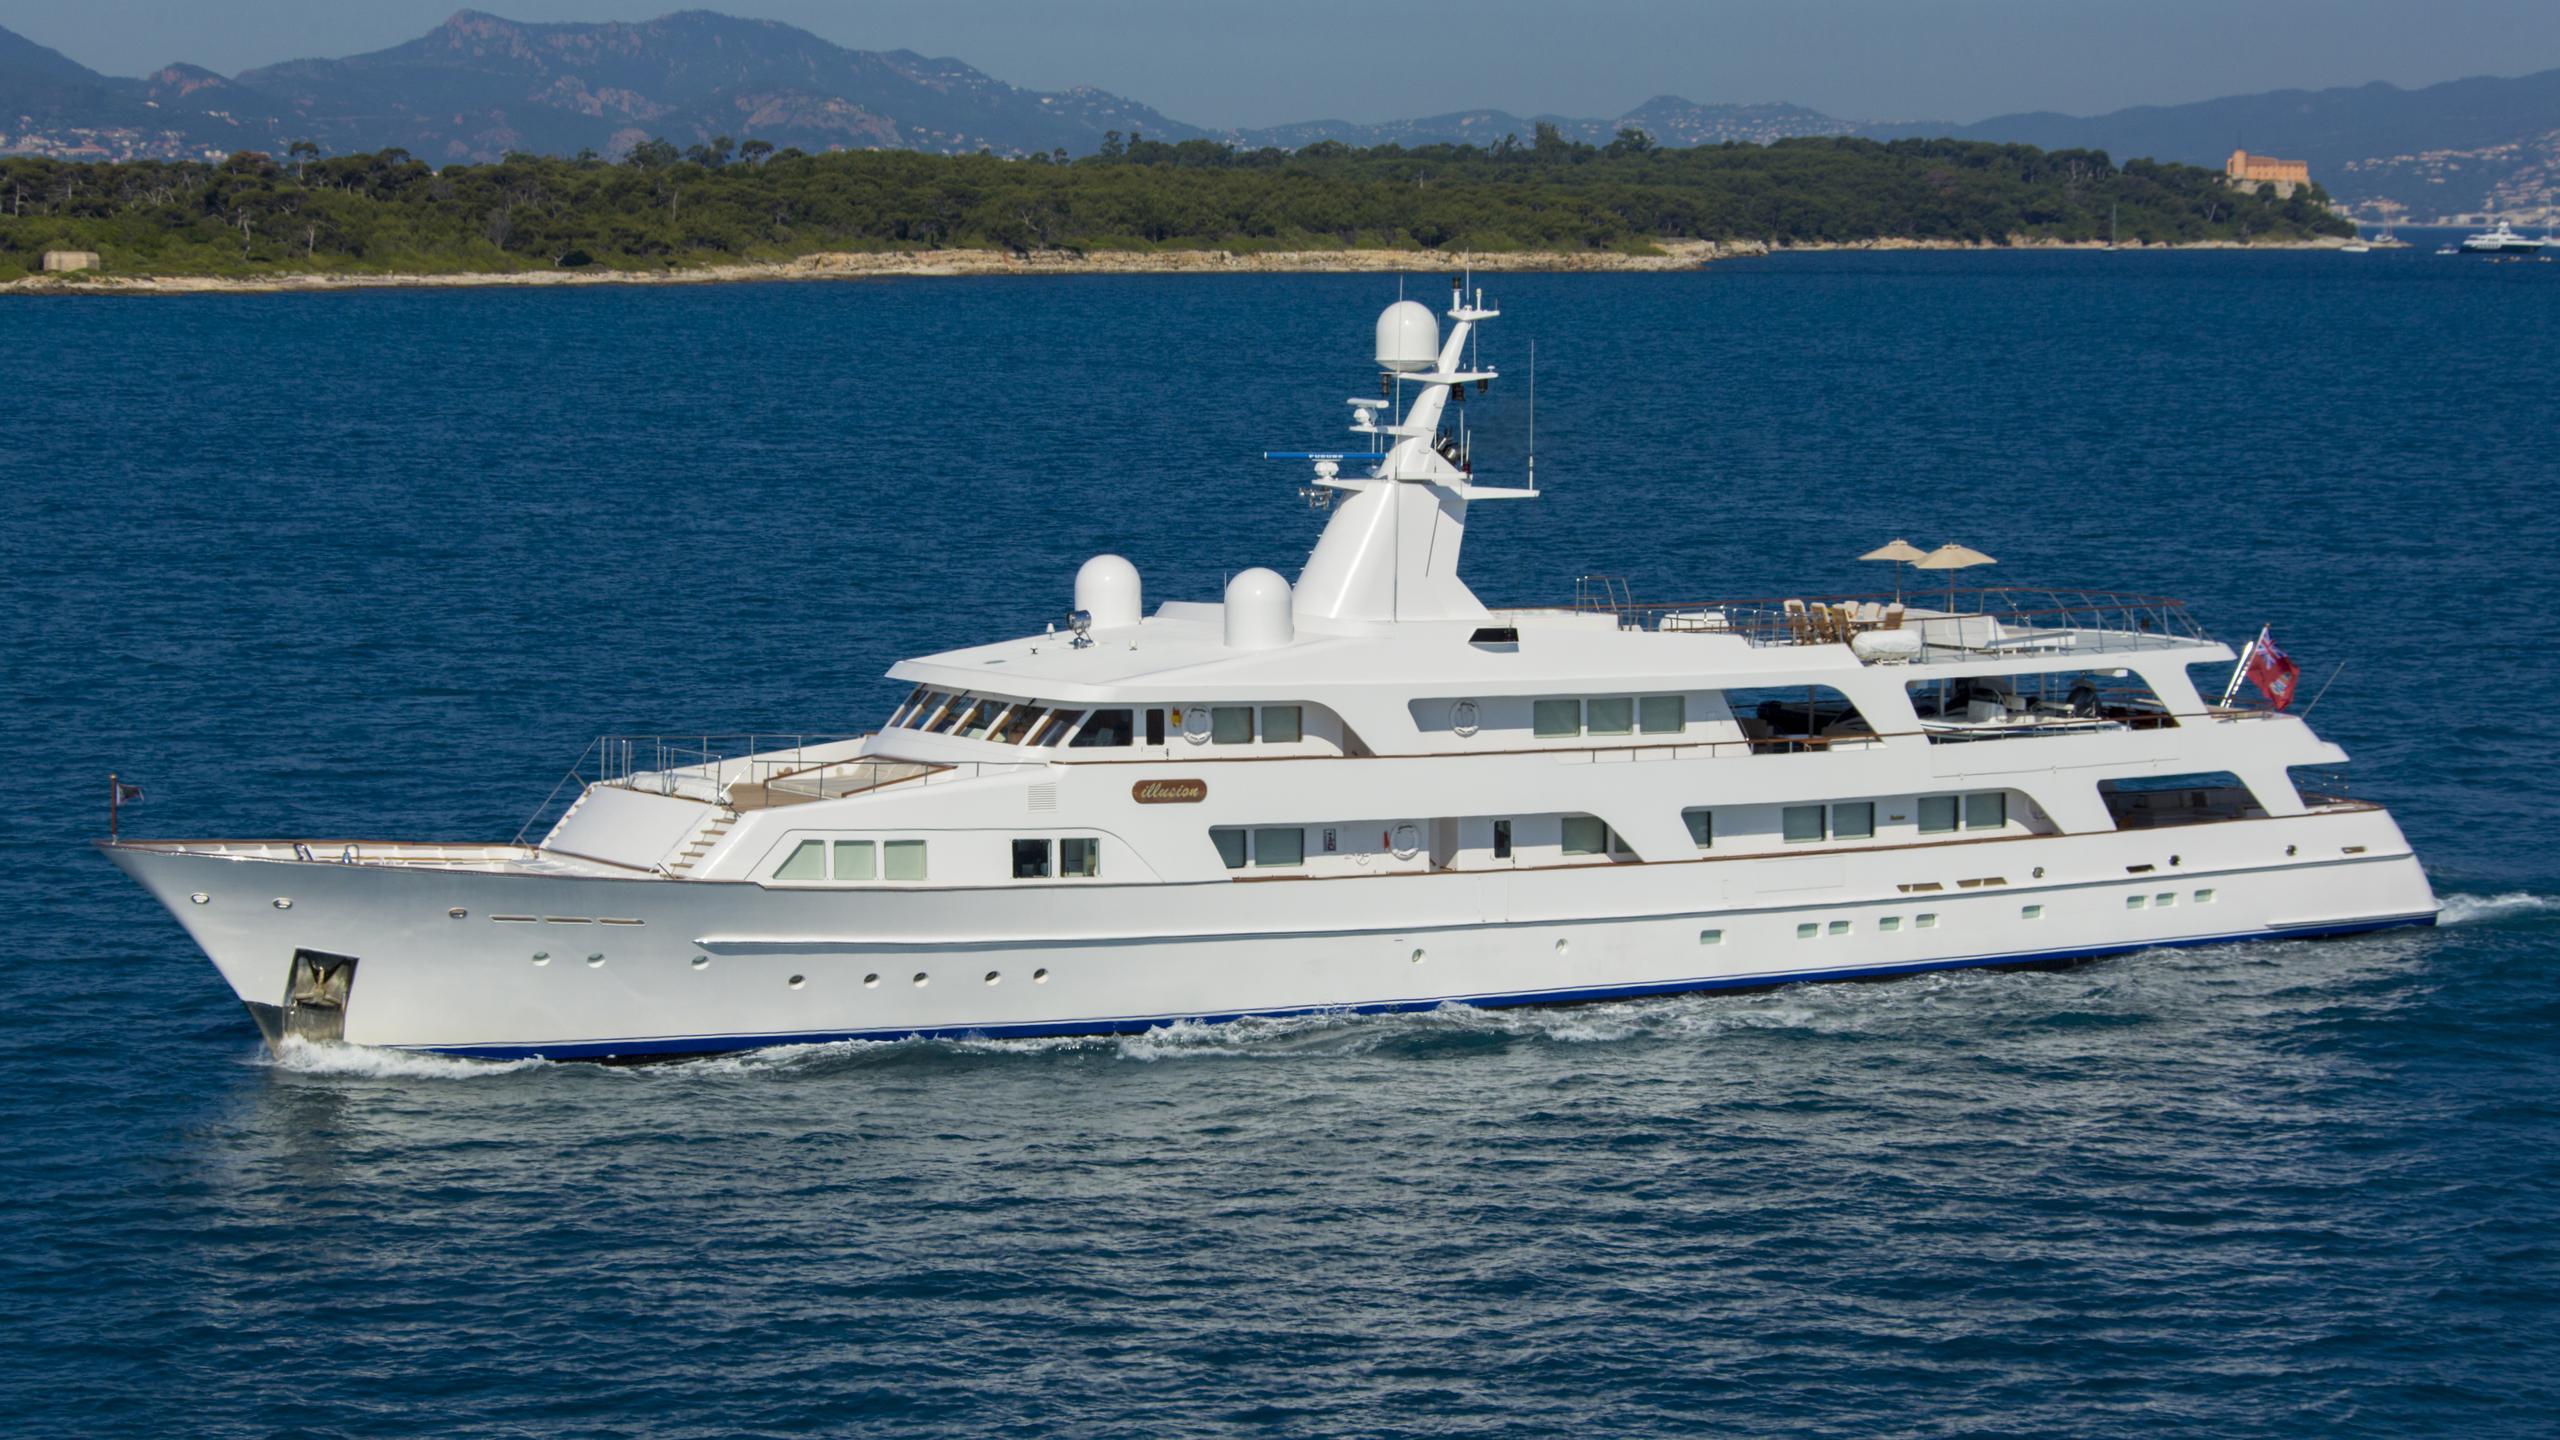 illusion-yacht-for-sale-profile